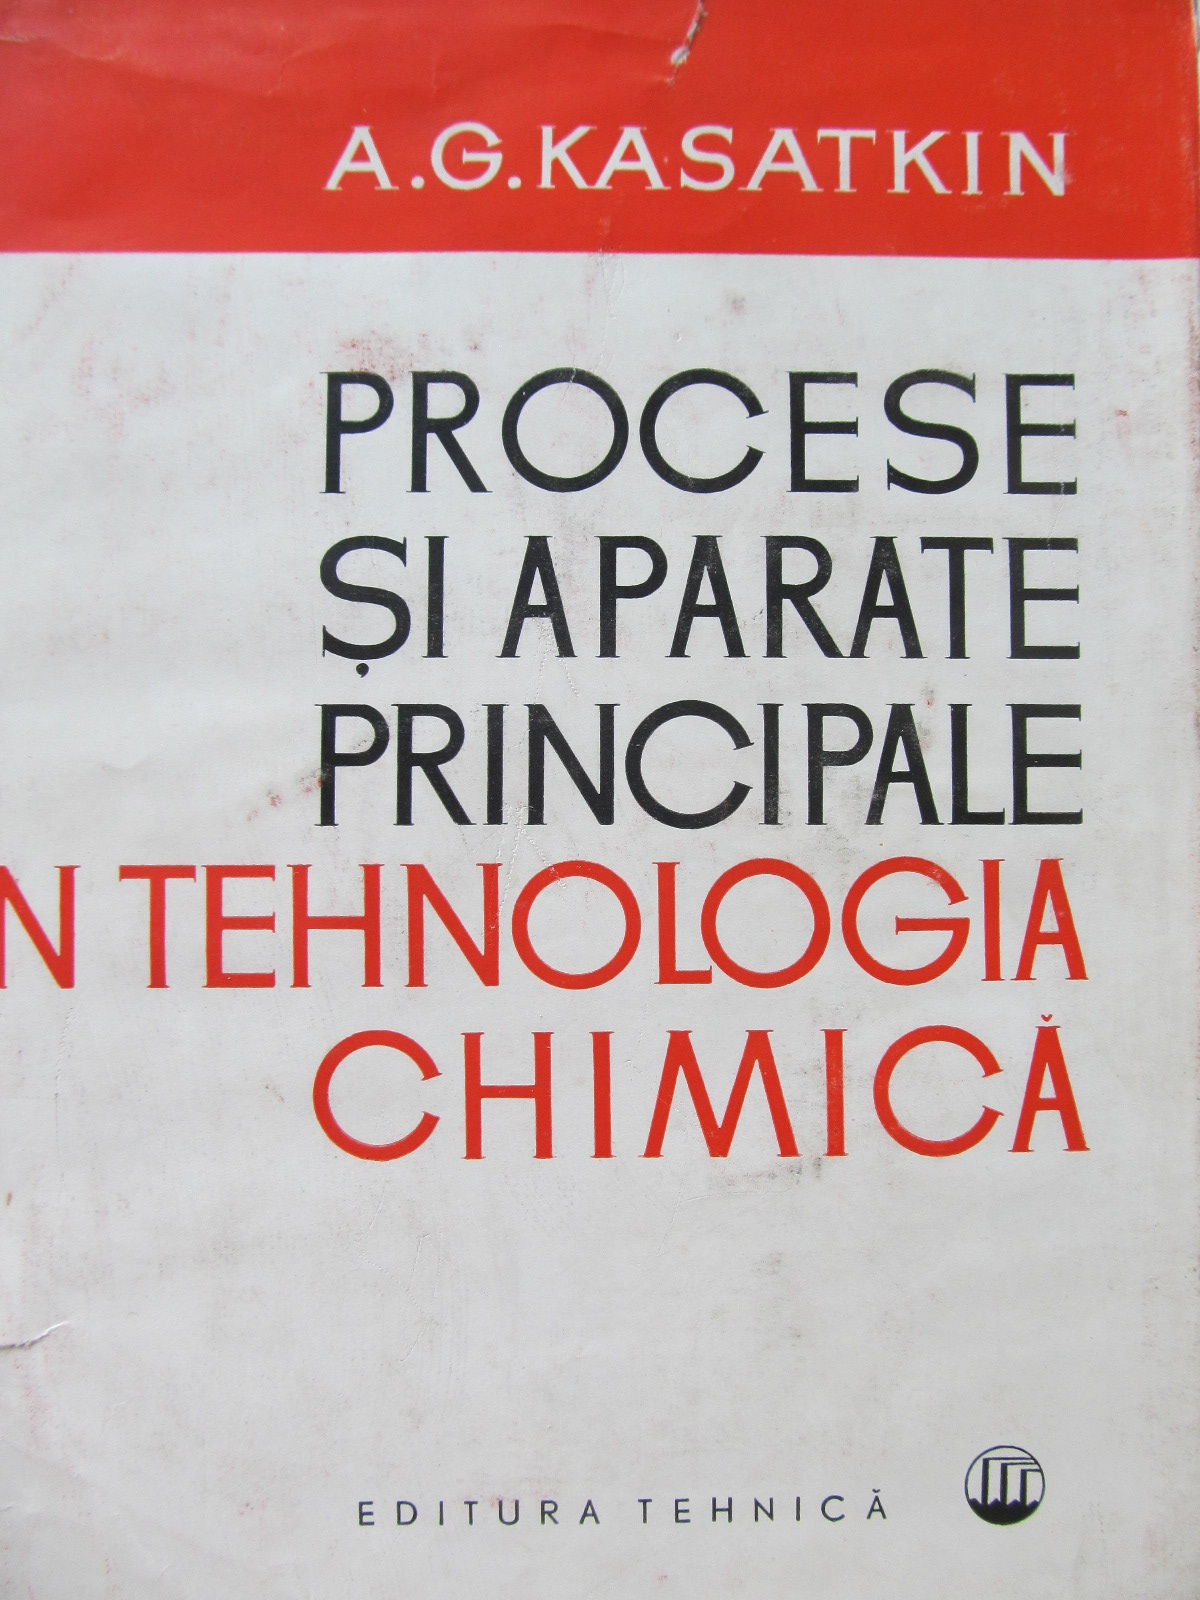 Procese si aparate principale in tehnologia chimica - A. G. Kasatkin | Detalii carte